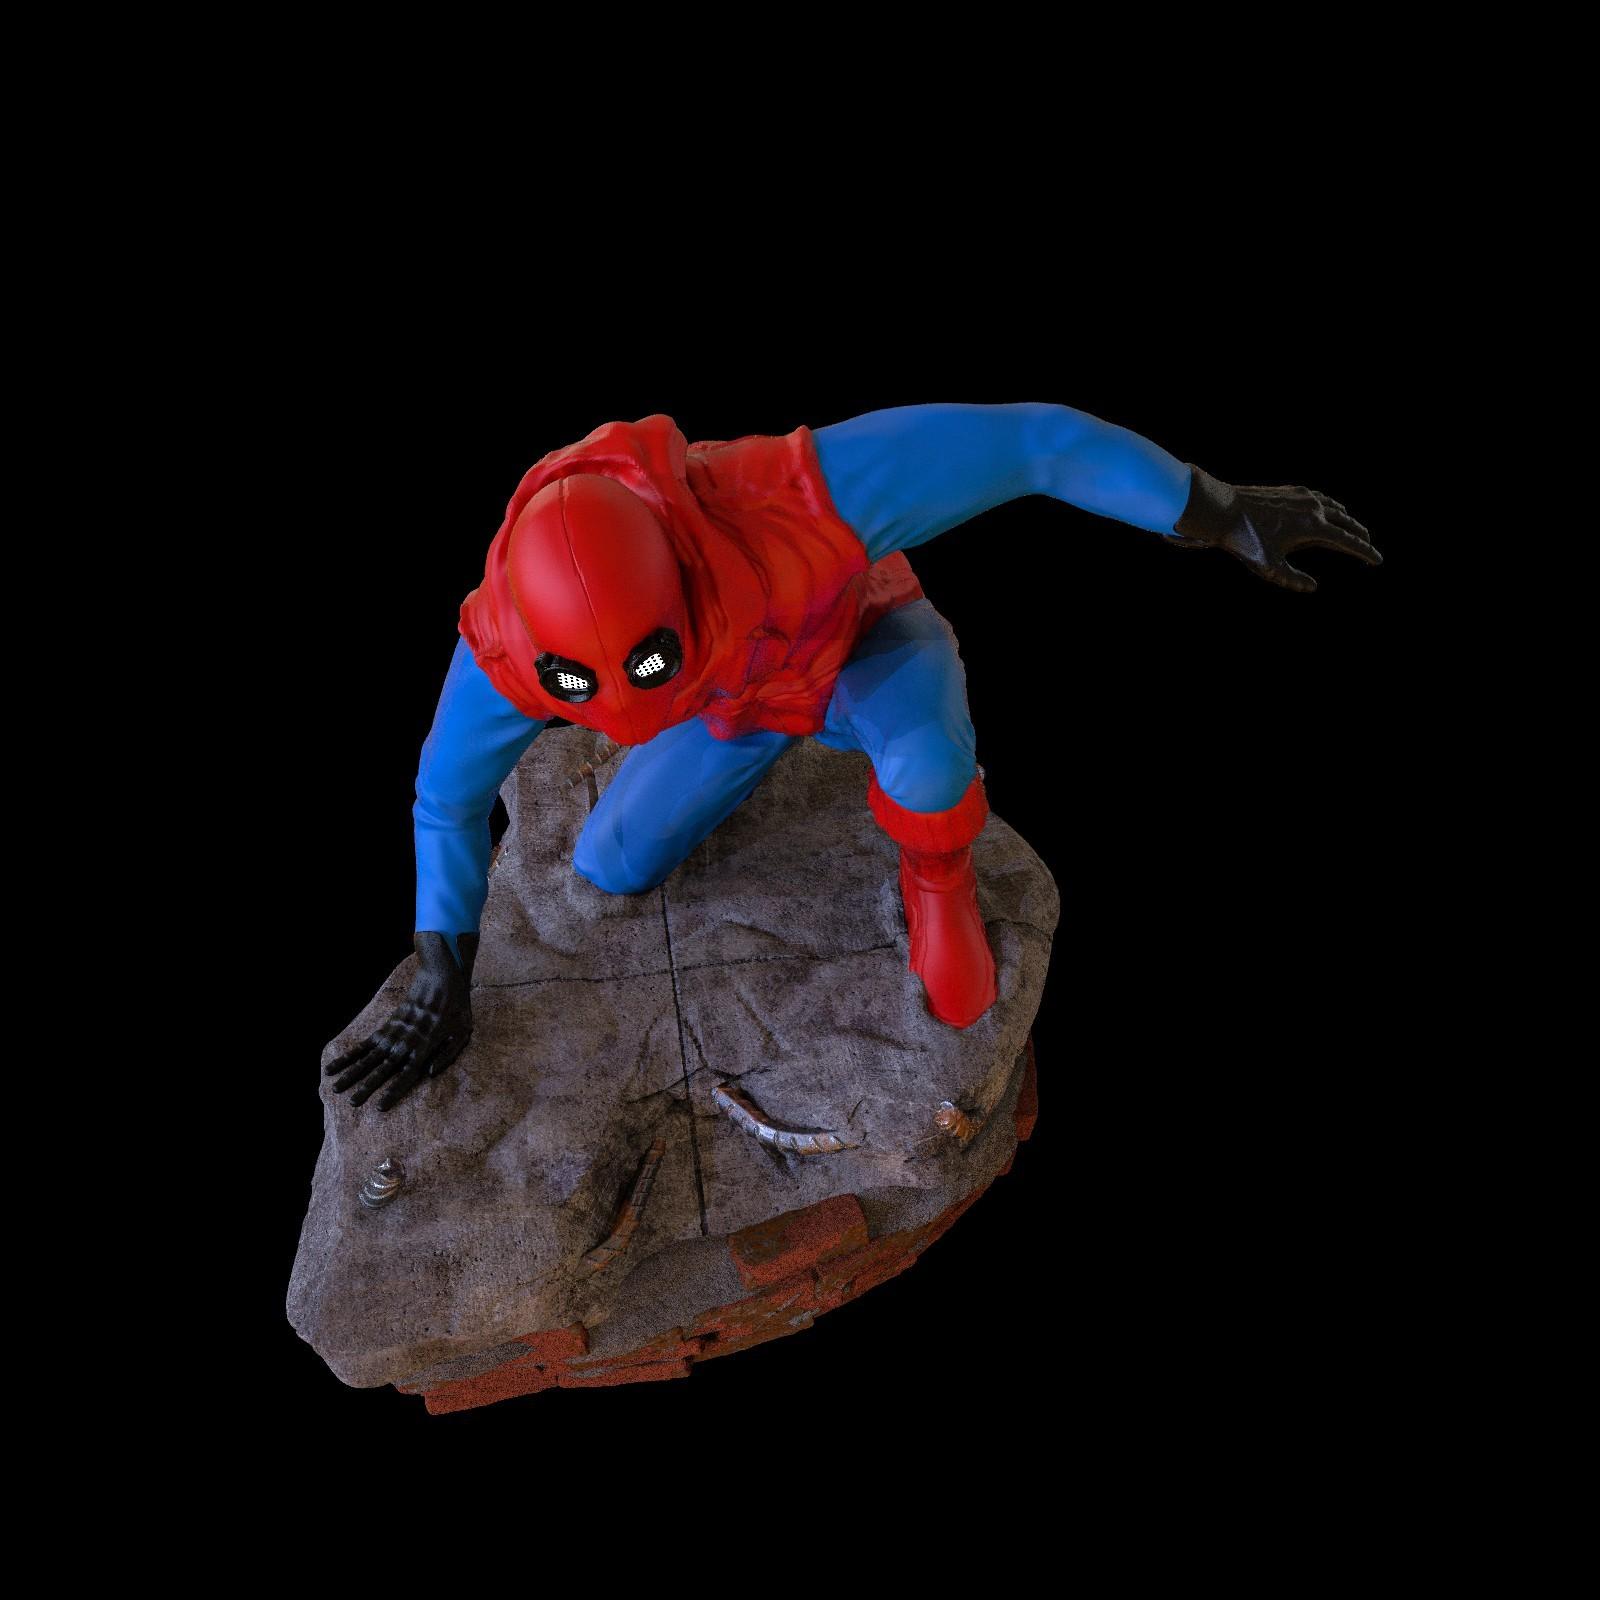 19.jpg Download STL file Spider-Man Homemade Suit • Design to 3D print, tolgaaxu